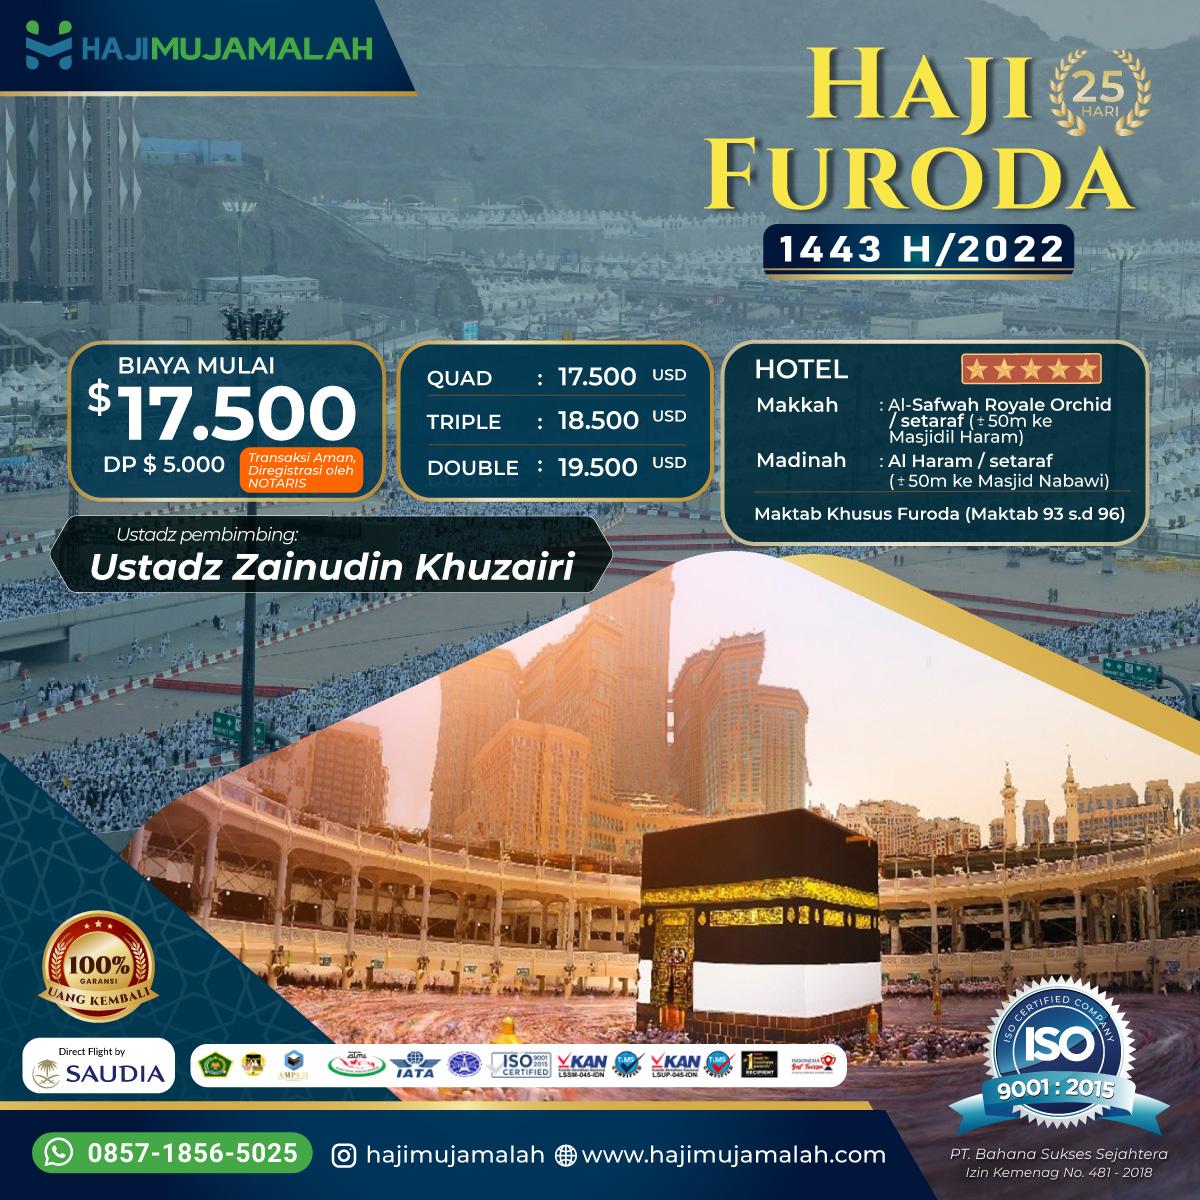 Haji Furoda Visa Mujamalah 2022 / 1443H